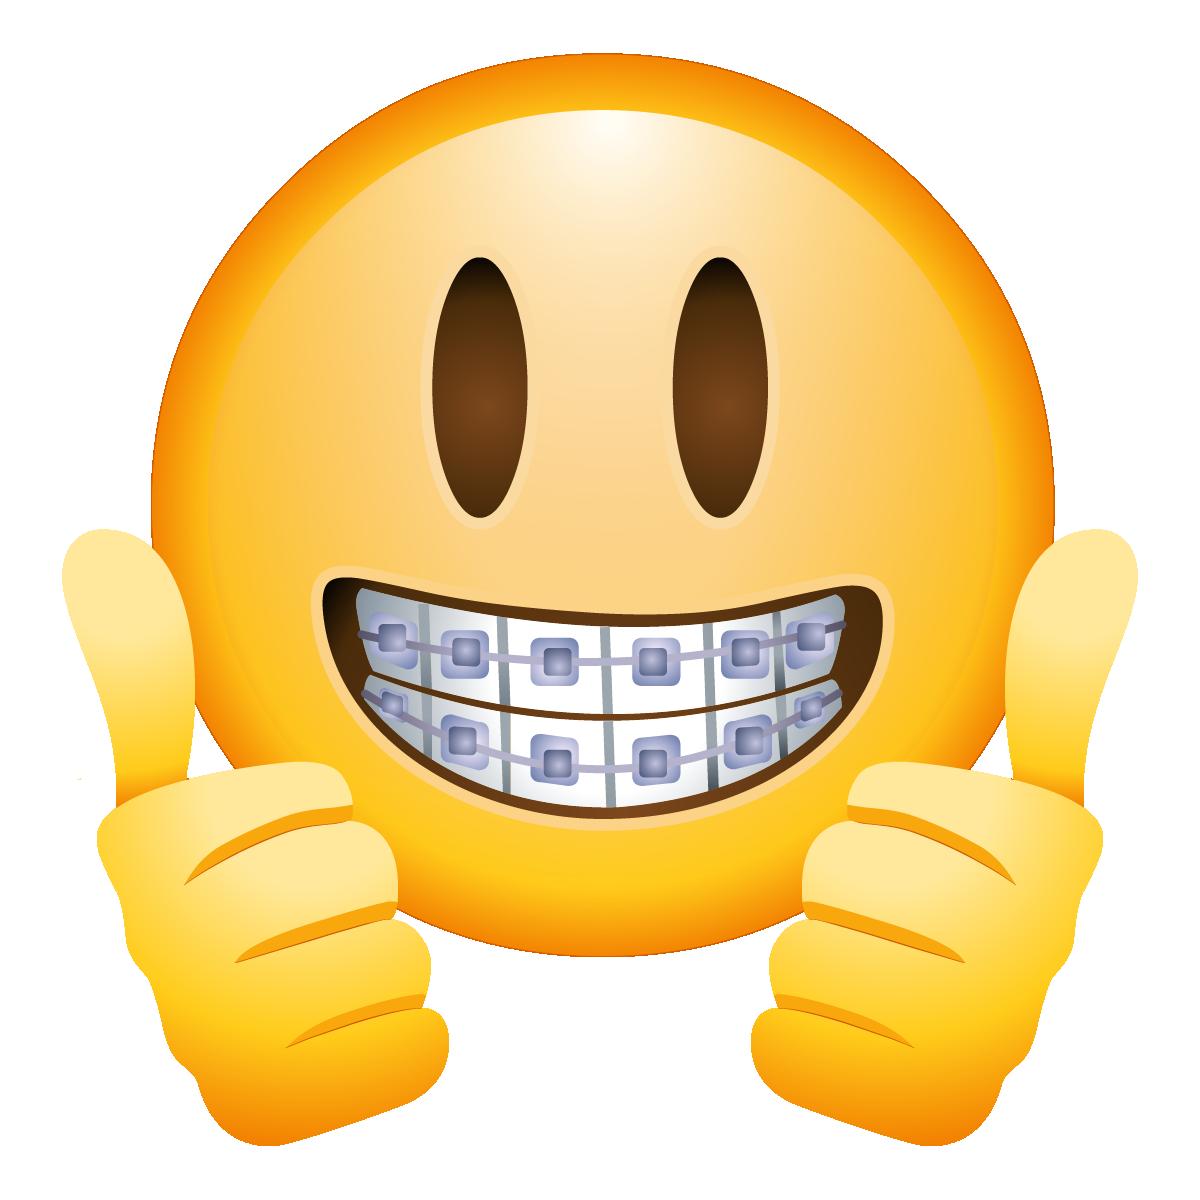 Download Emoticon Sticker Smiley Emoji PNG Free Photo ICON